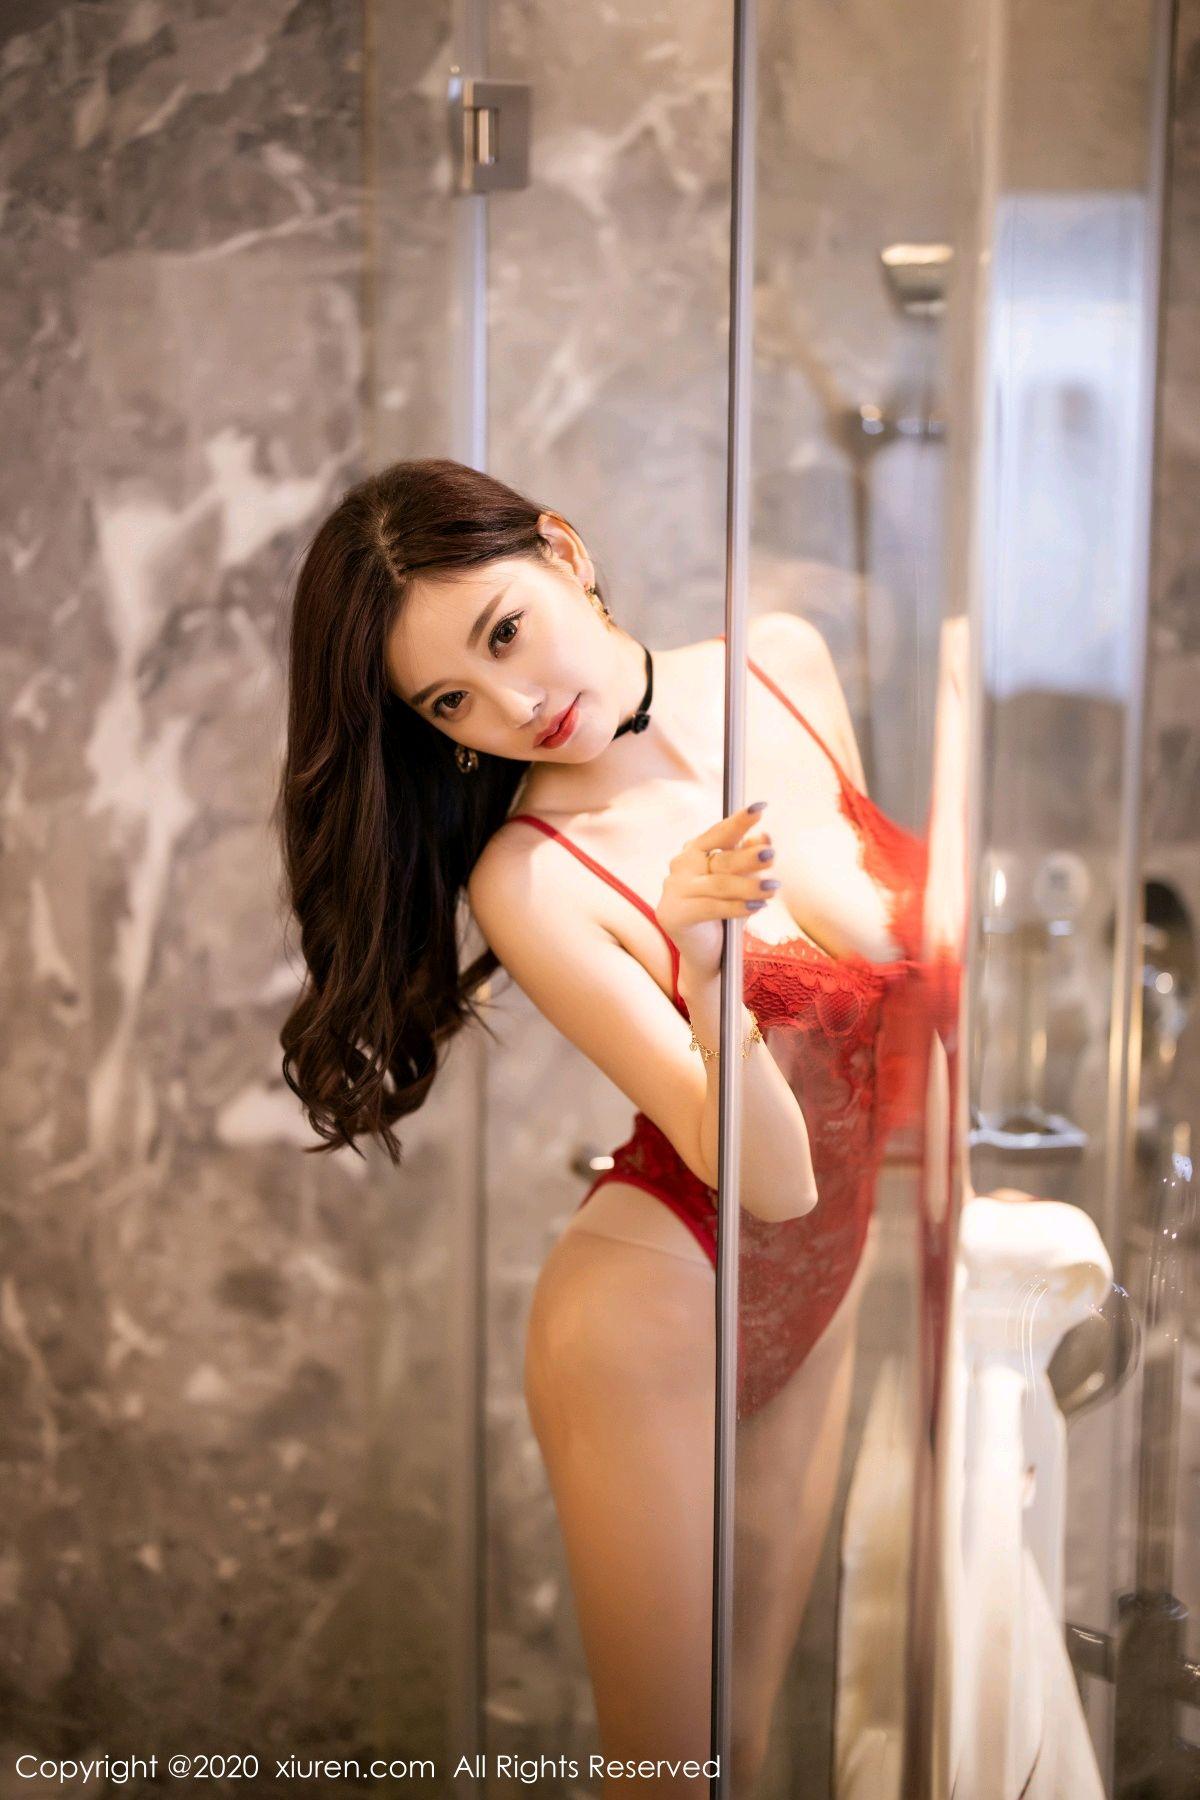 [XiuRen] Vol.2671 Yang Chen Chen 31P, Underwear, Xiuren, Yang Chen Chen